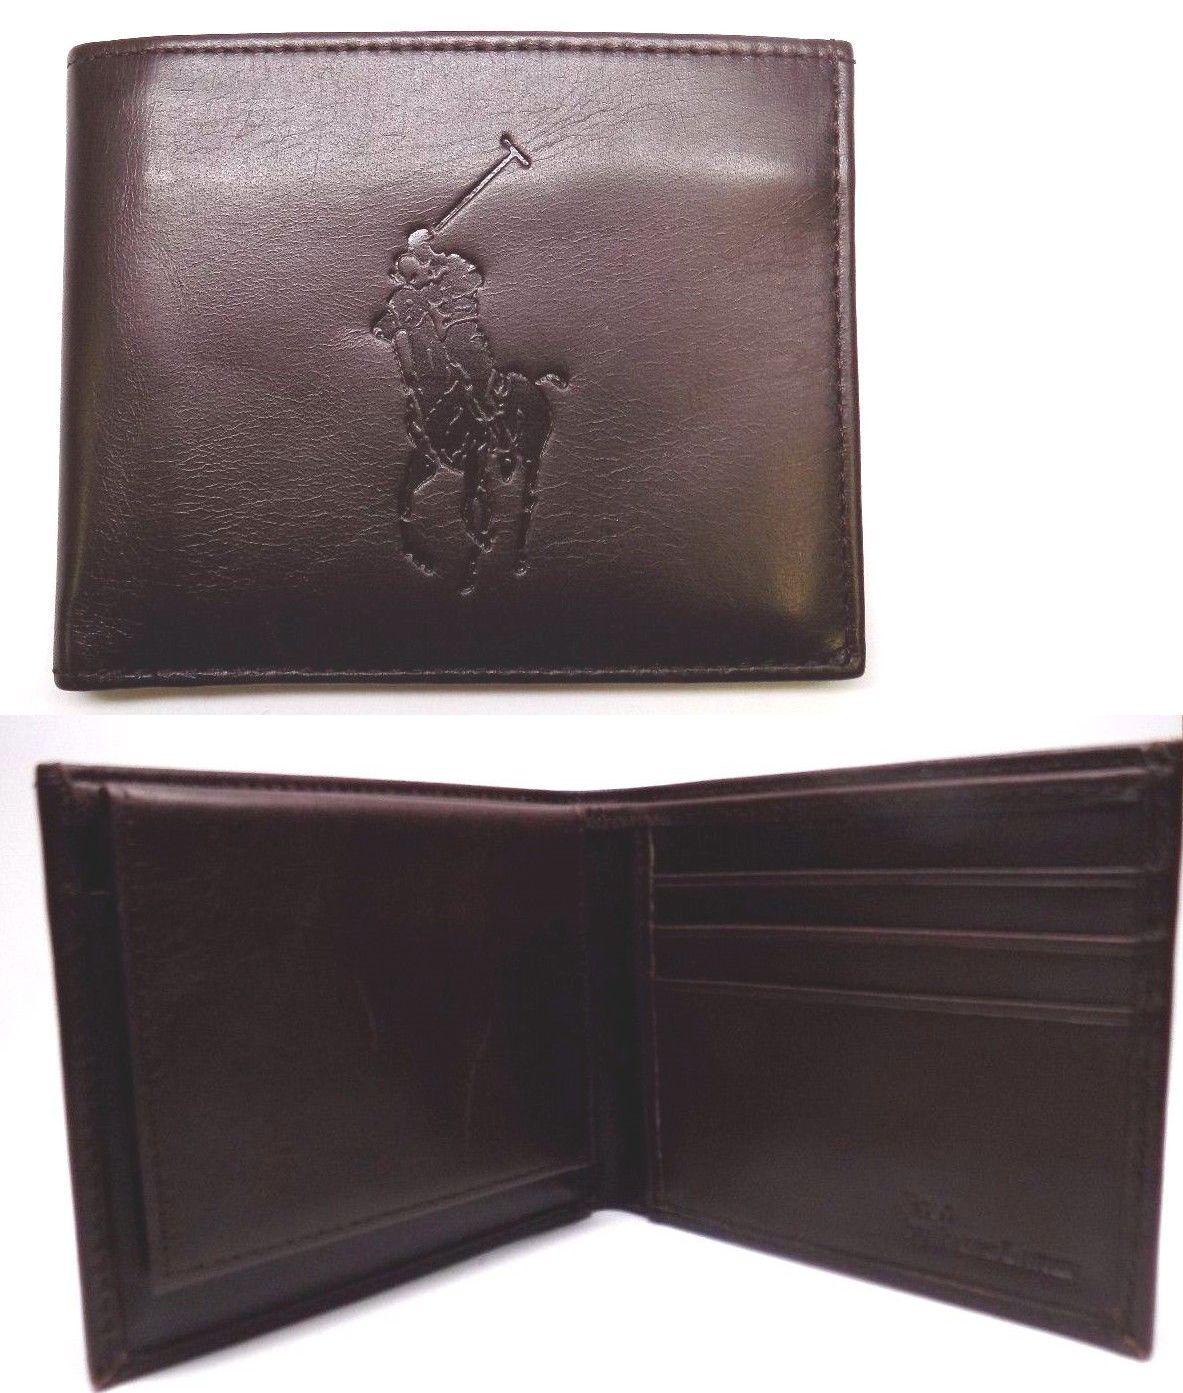 4d8cb06e39 ... cheap wallets 2996 new men s polo ralph lauren big pony brown leather  id passcase billfold